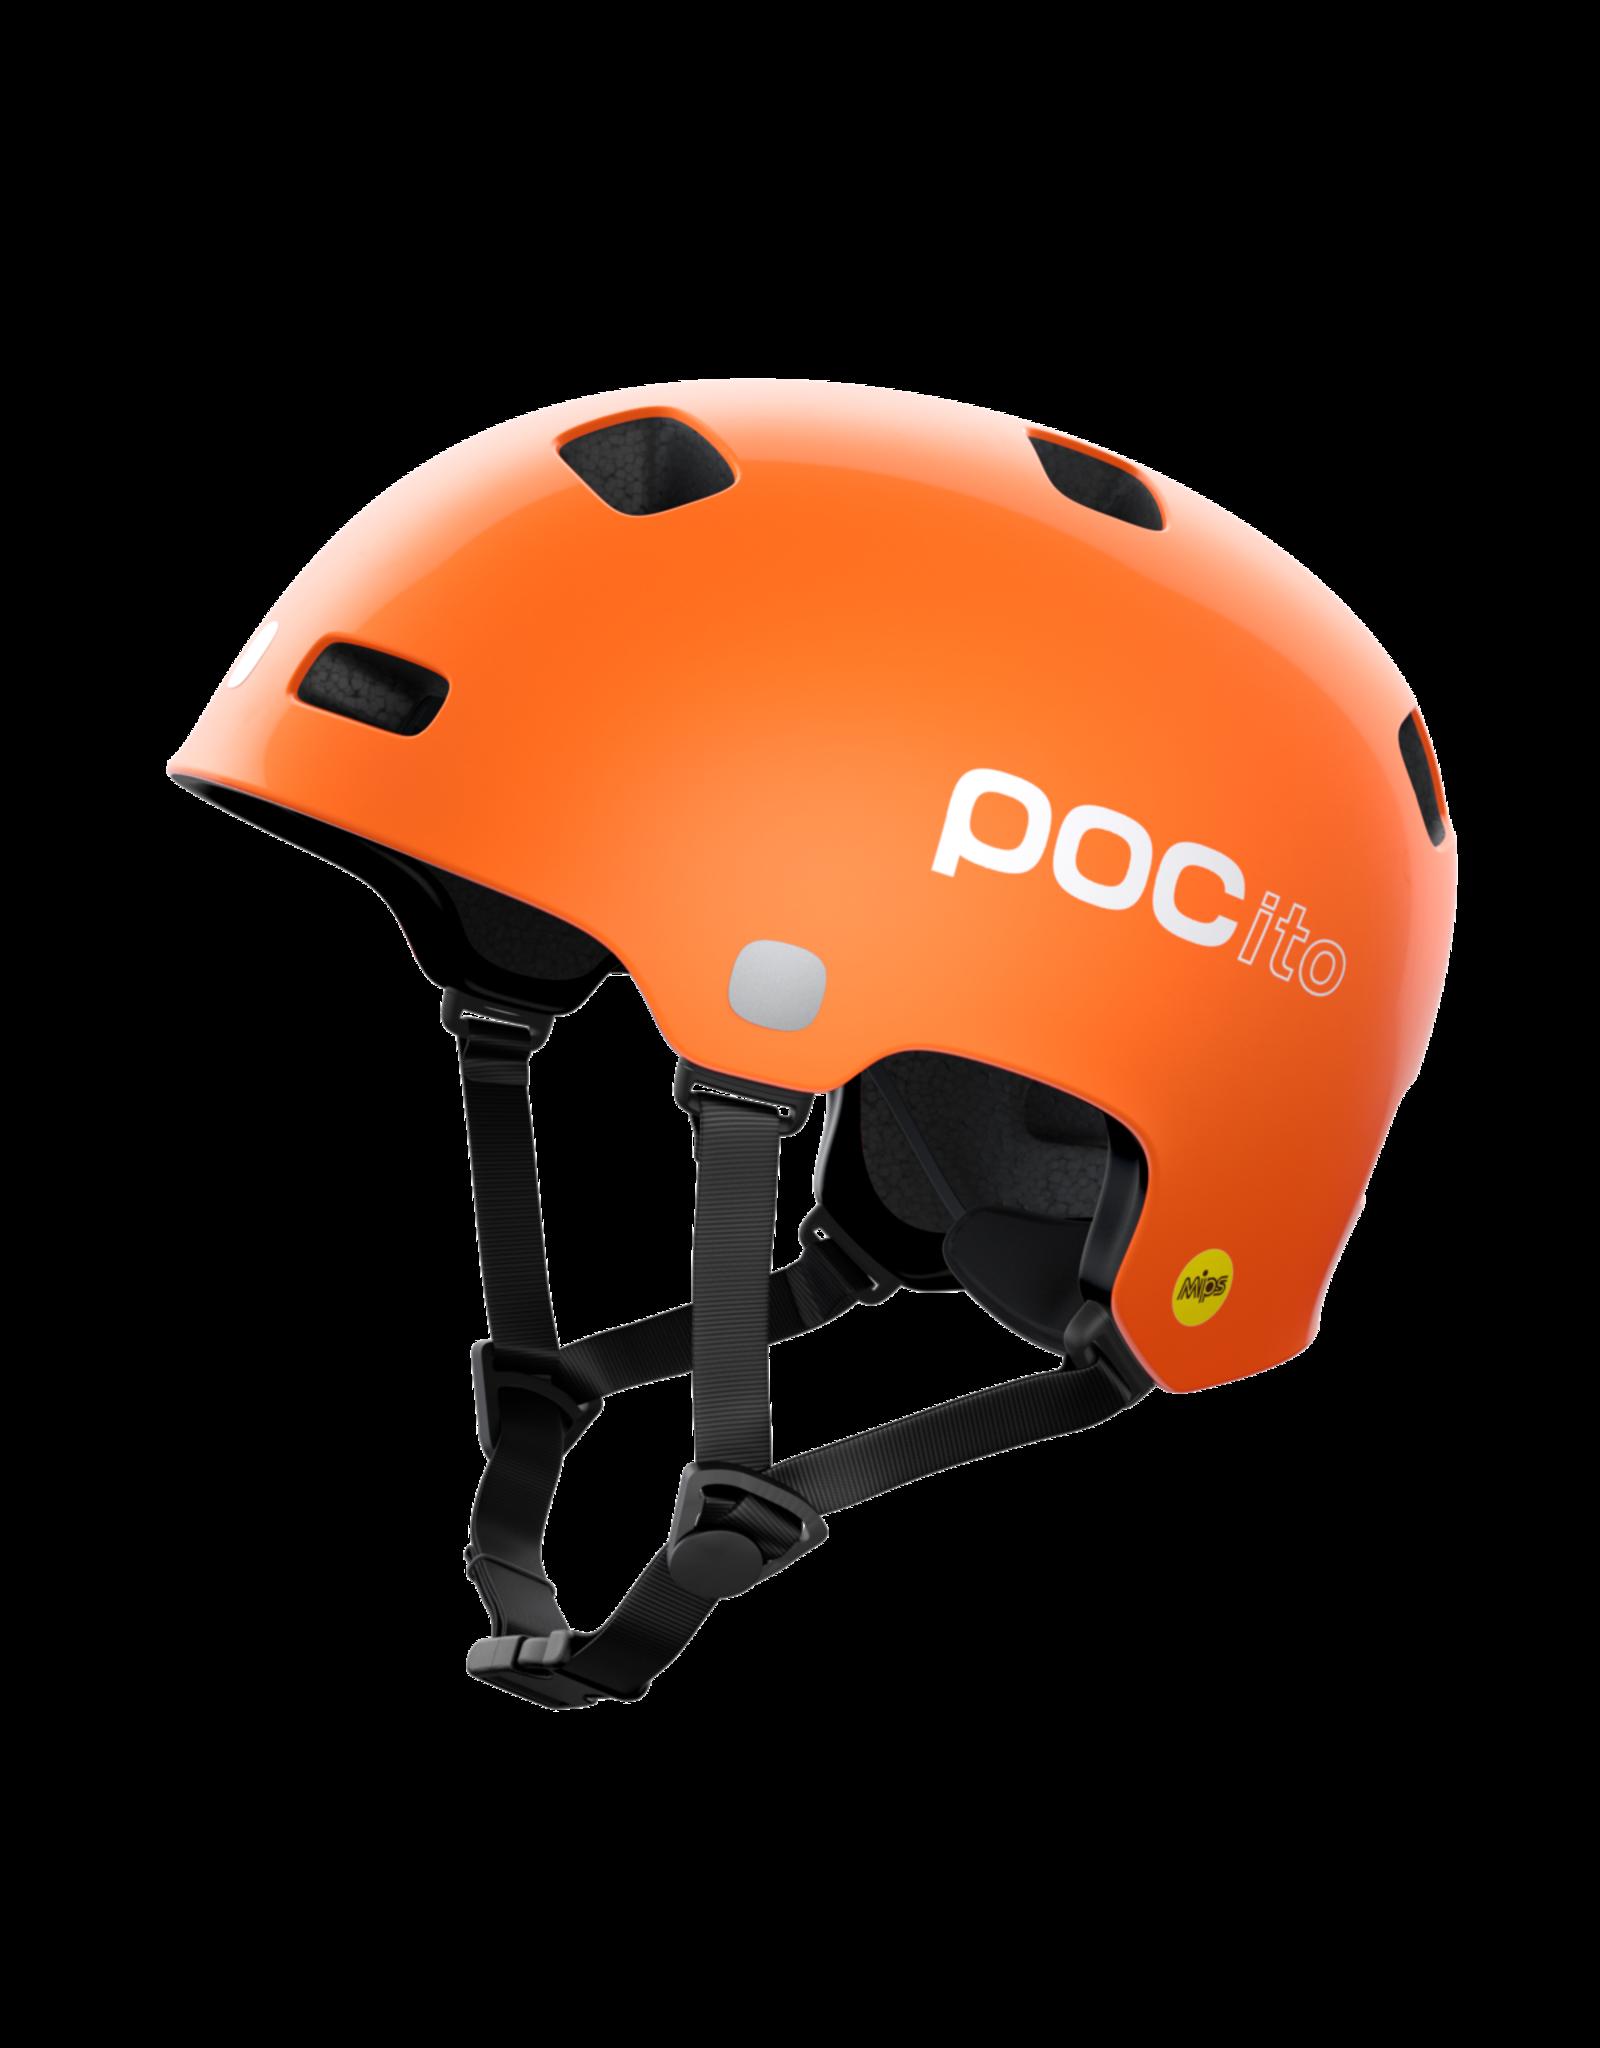 POC POCito Crane MIPS Youth Helmet